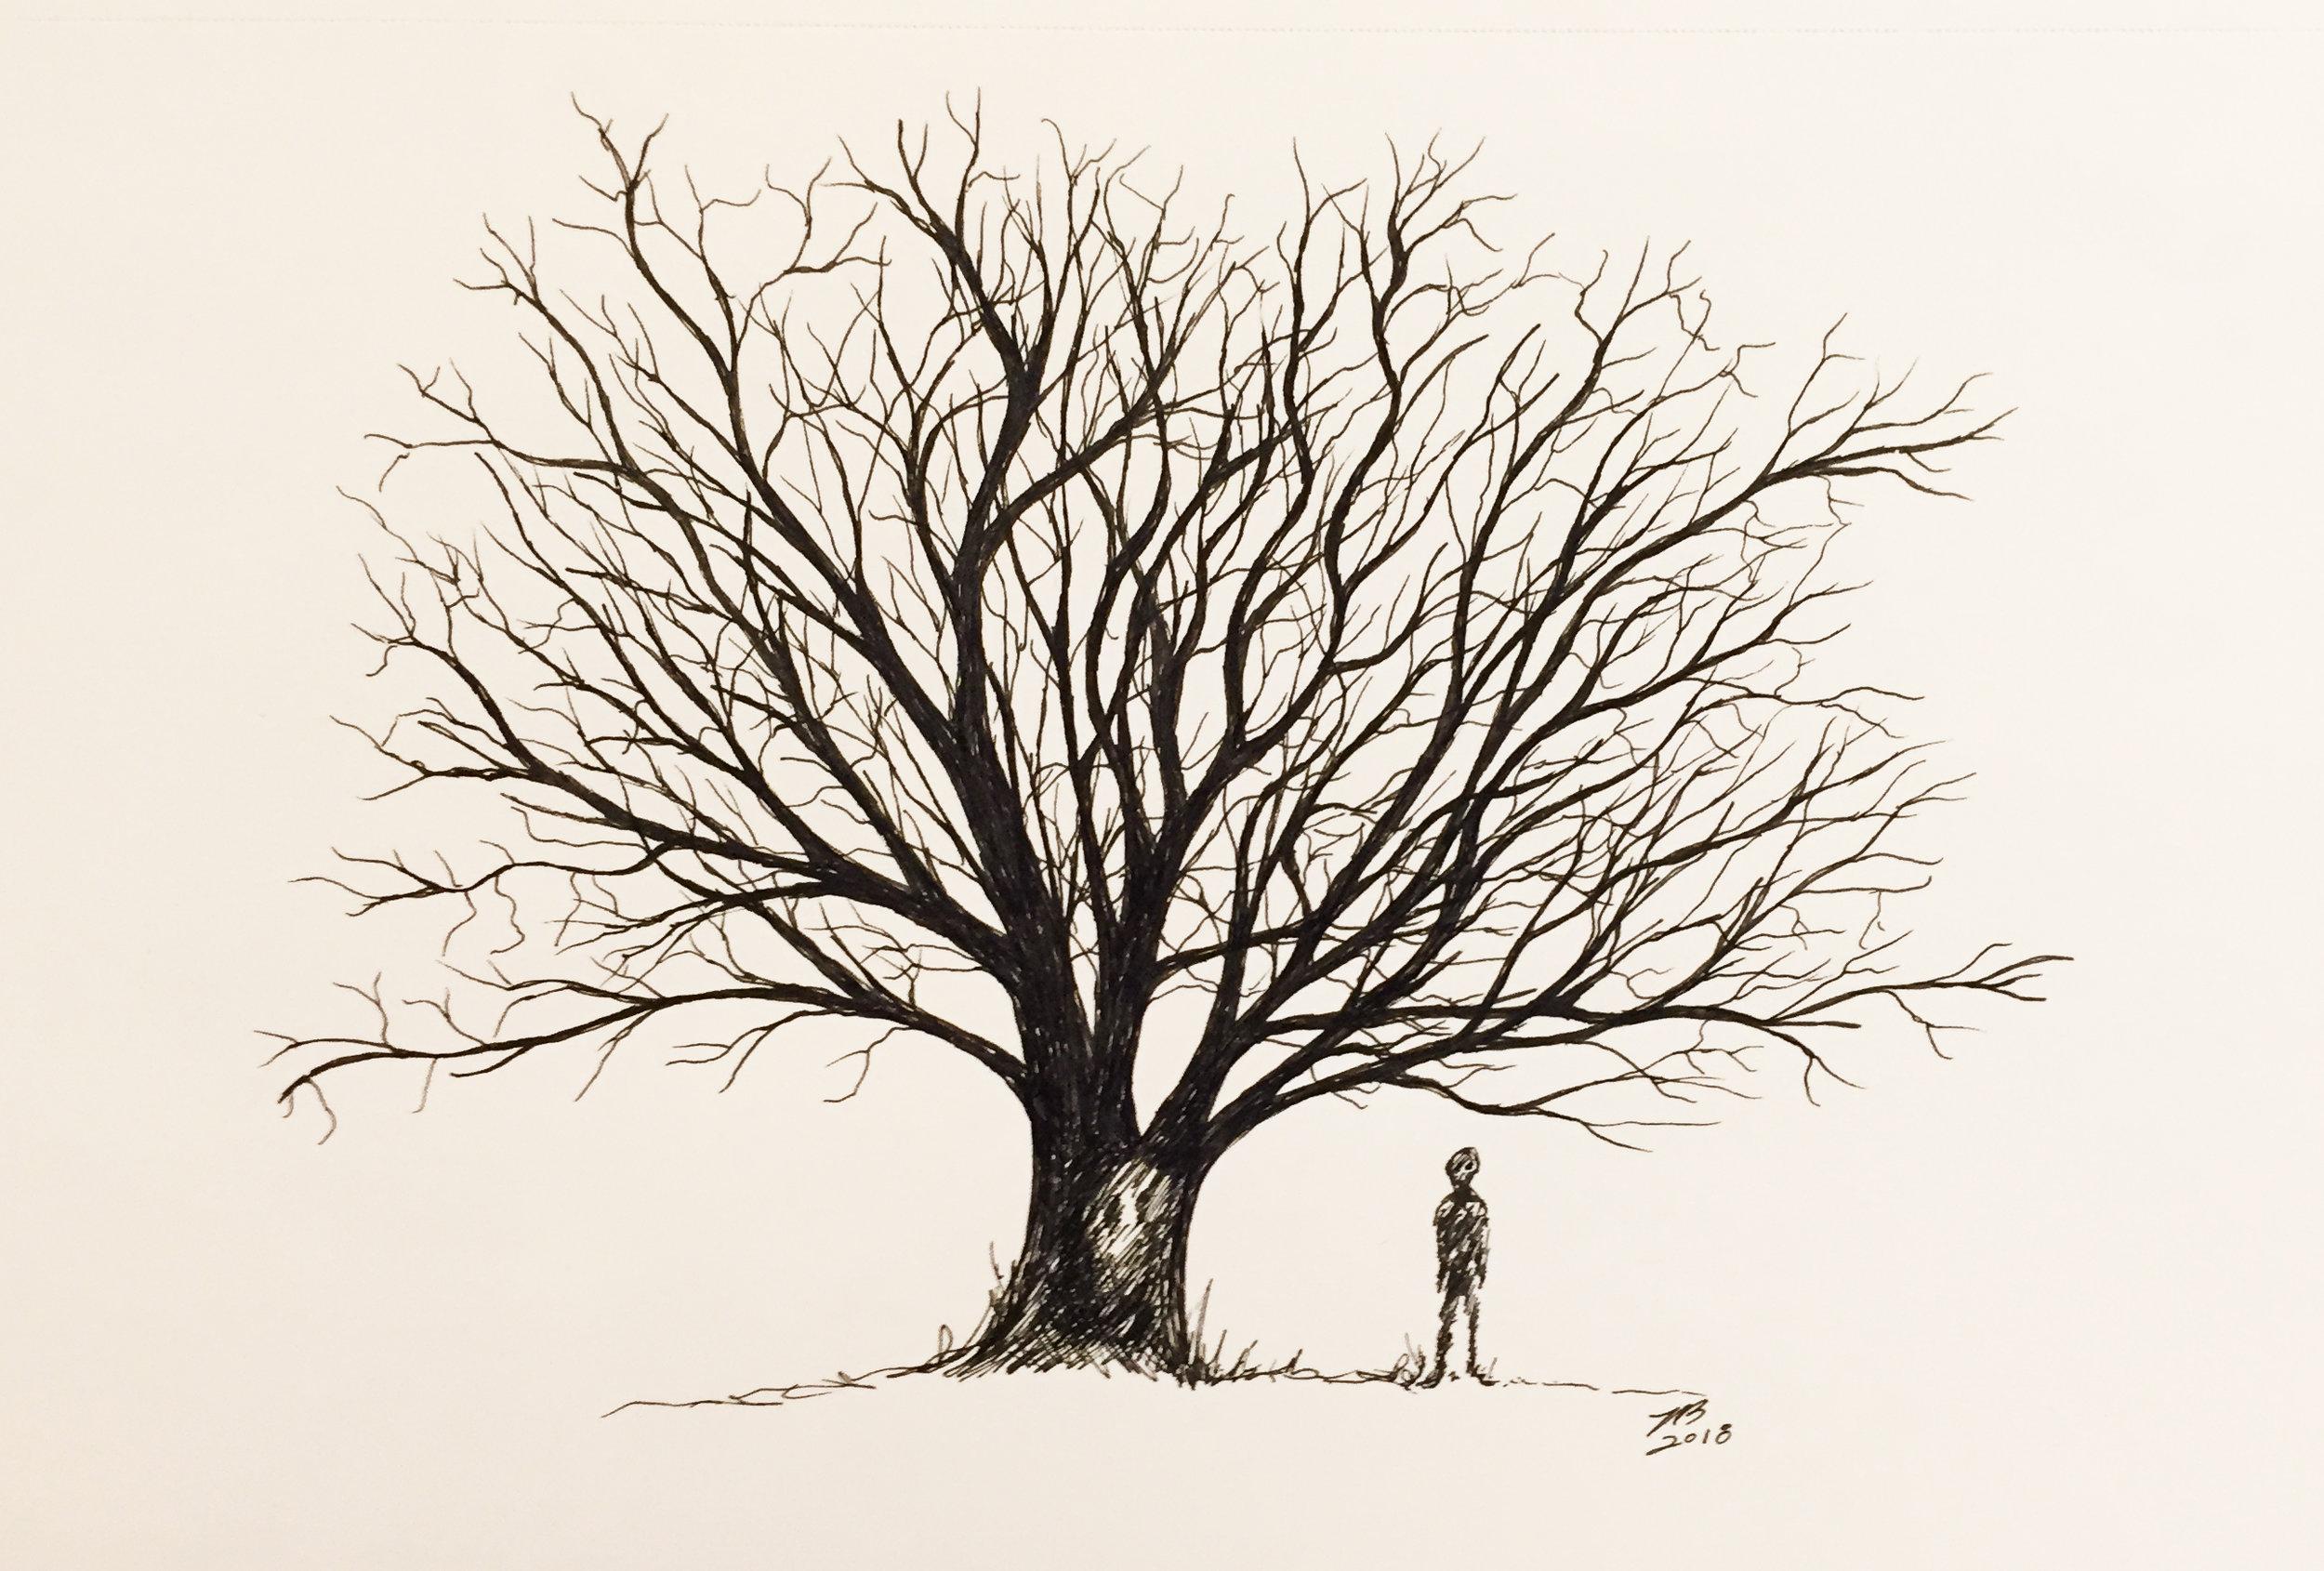 Tree of Change - Krysta Bernhardt